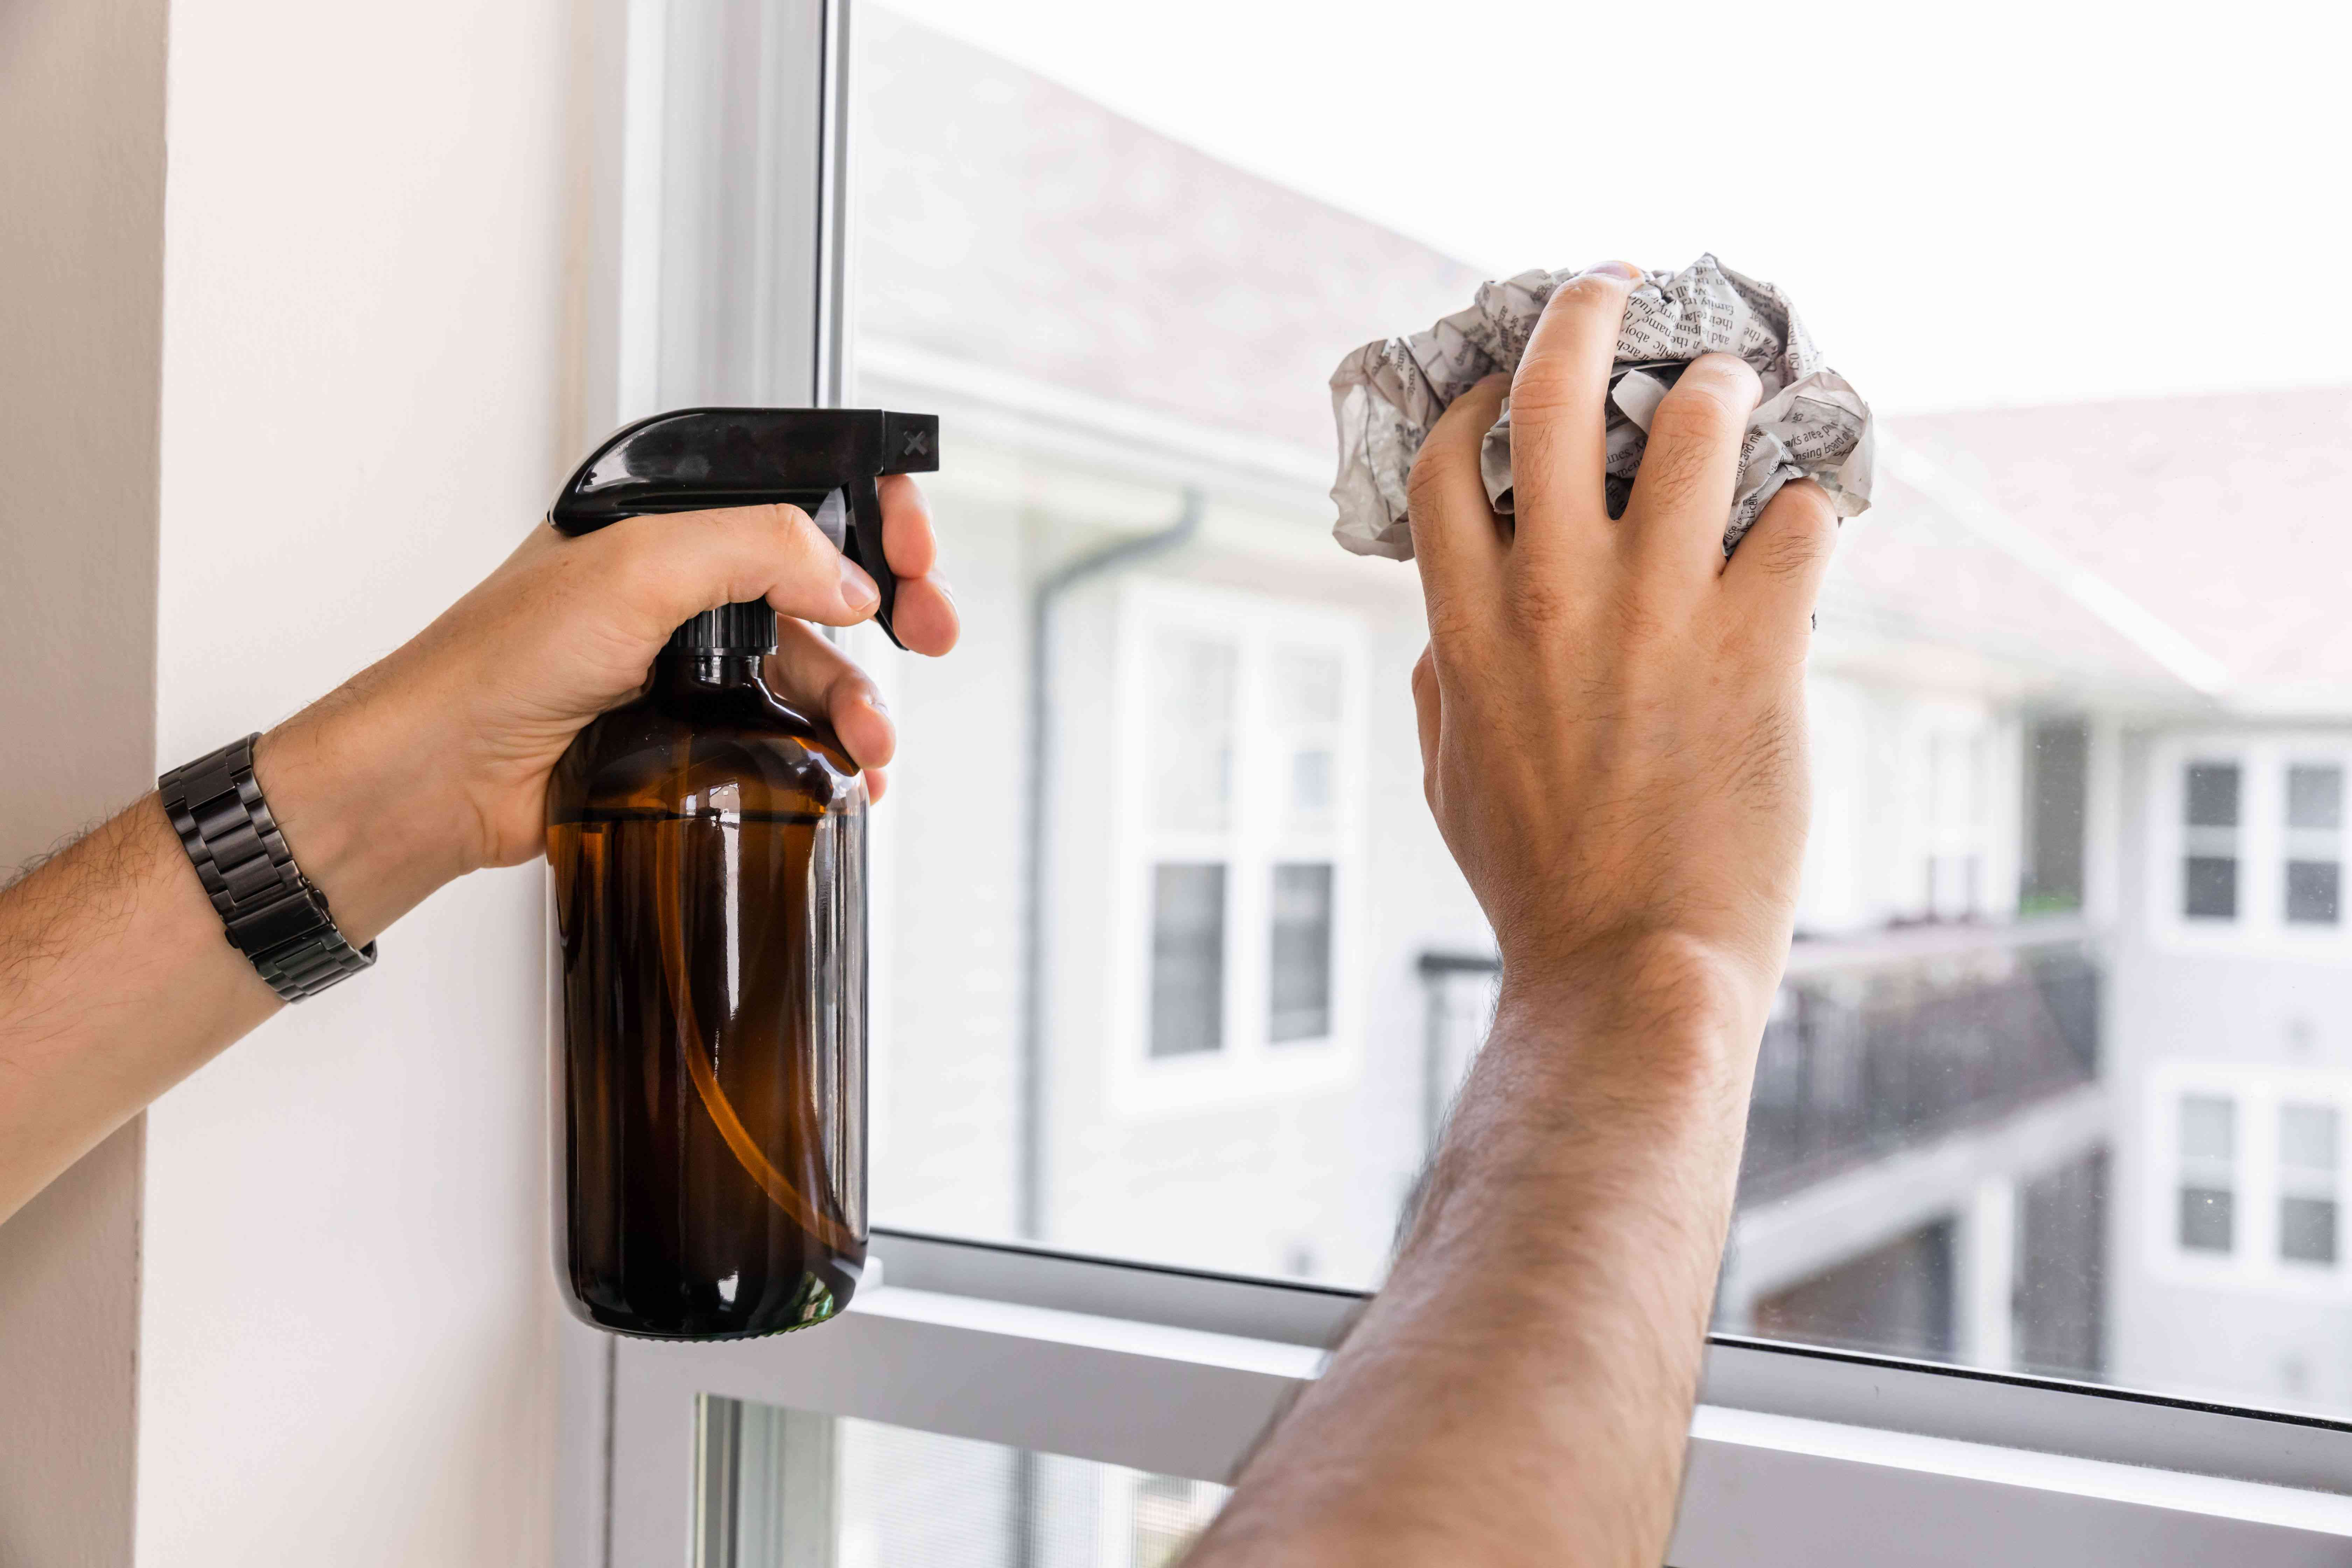 Using homemade glass cleaner